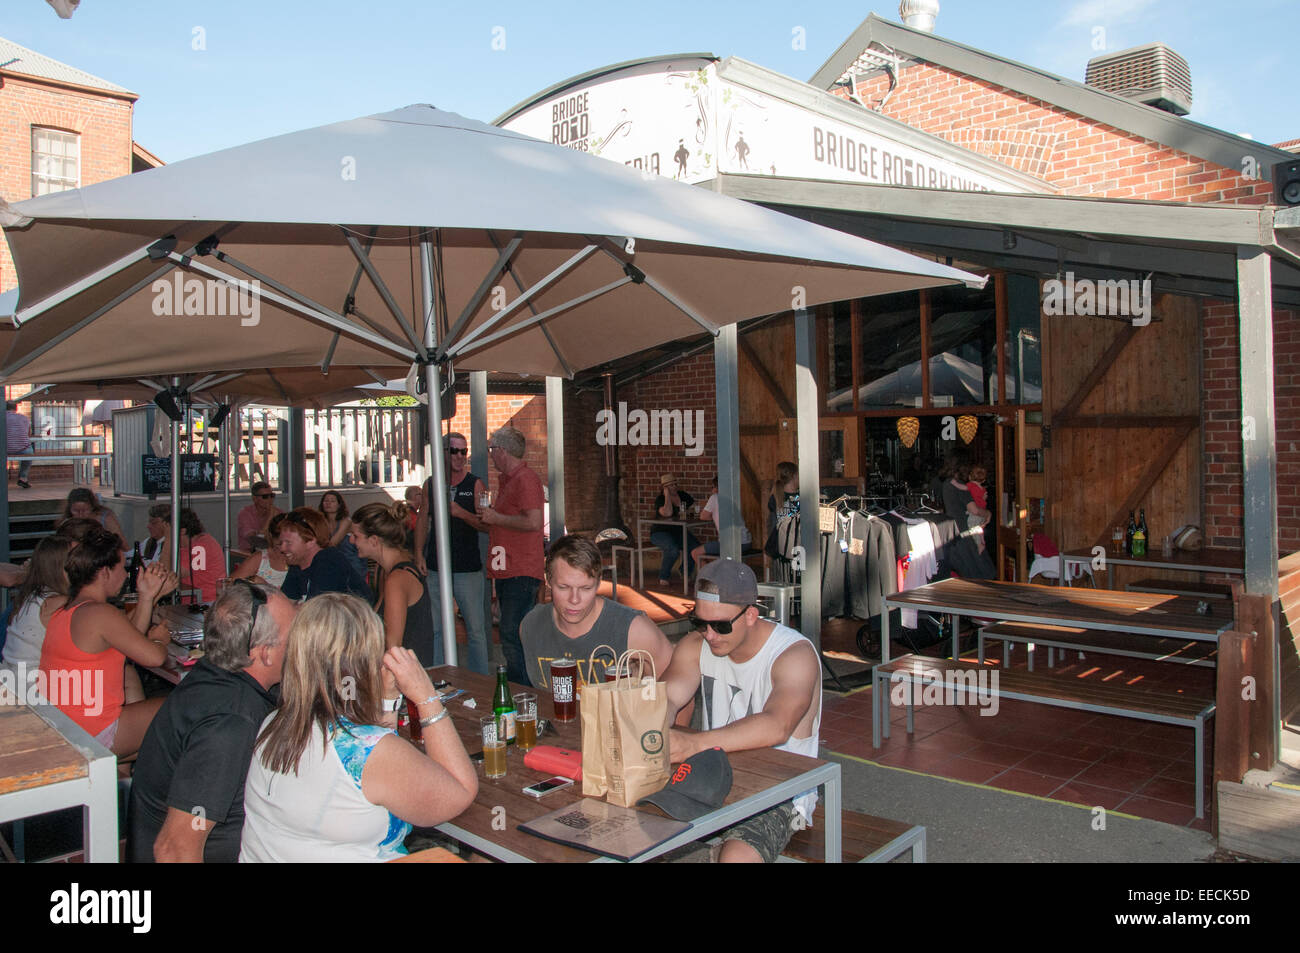 Outdoor bar area at bridge road brewers beechworth ne victoria